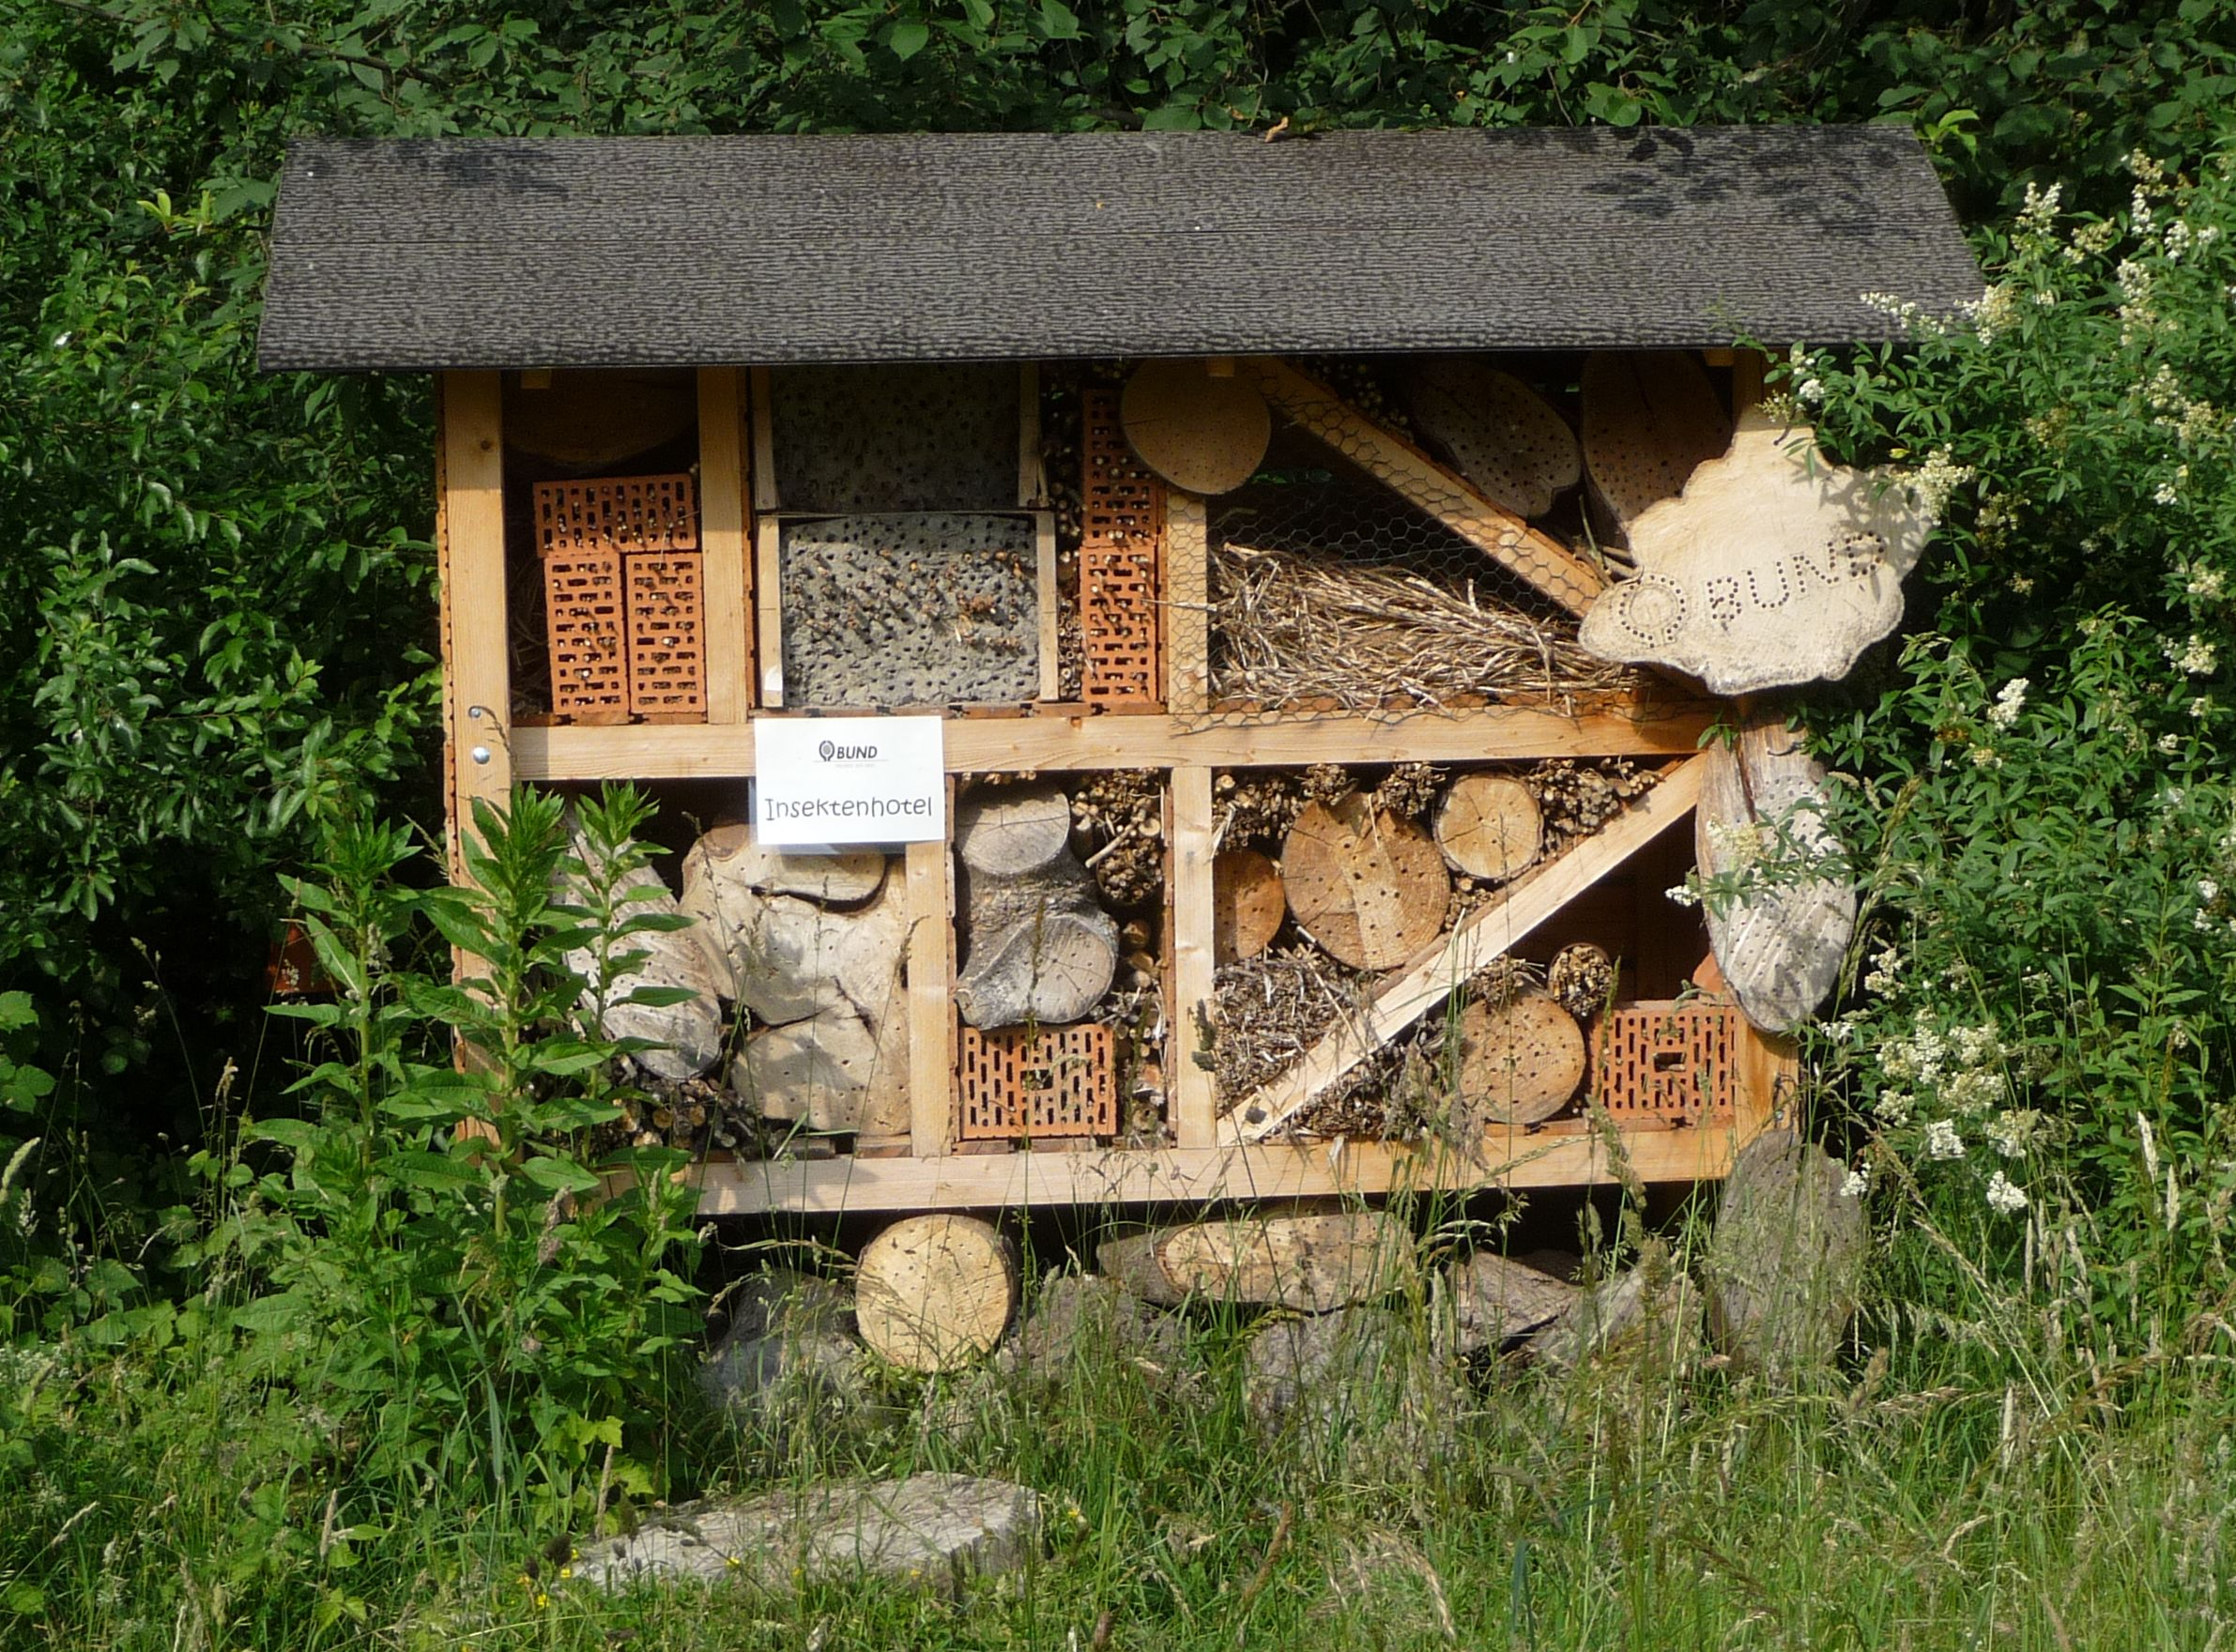 file insektenhotel neuhofen pfalz jpg wikimedia commons. Black Bedroom Furniture Sets. Home Design Ideas